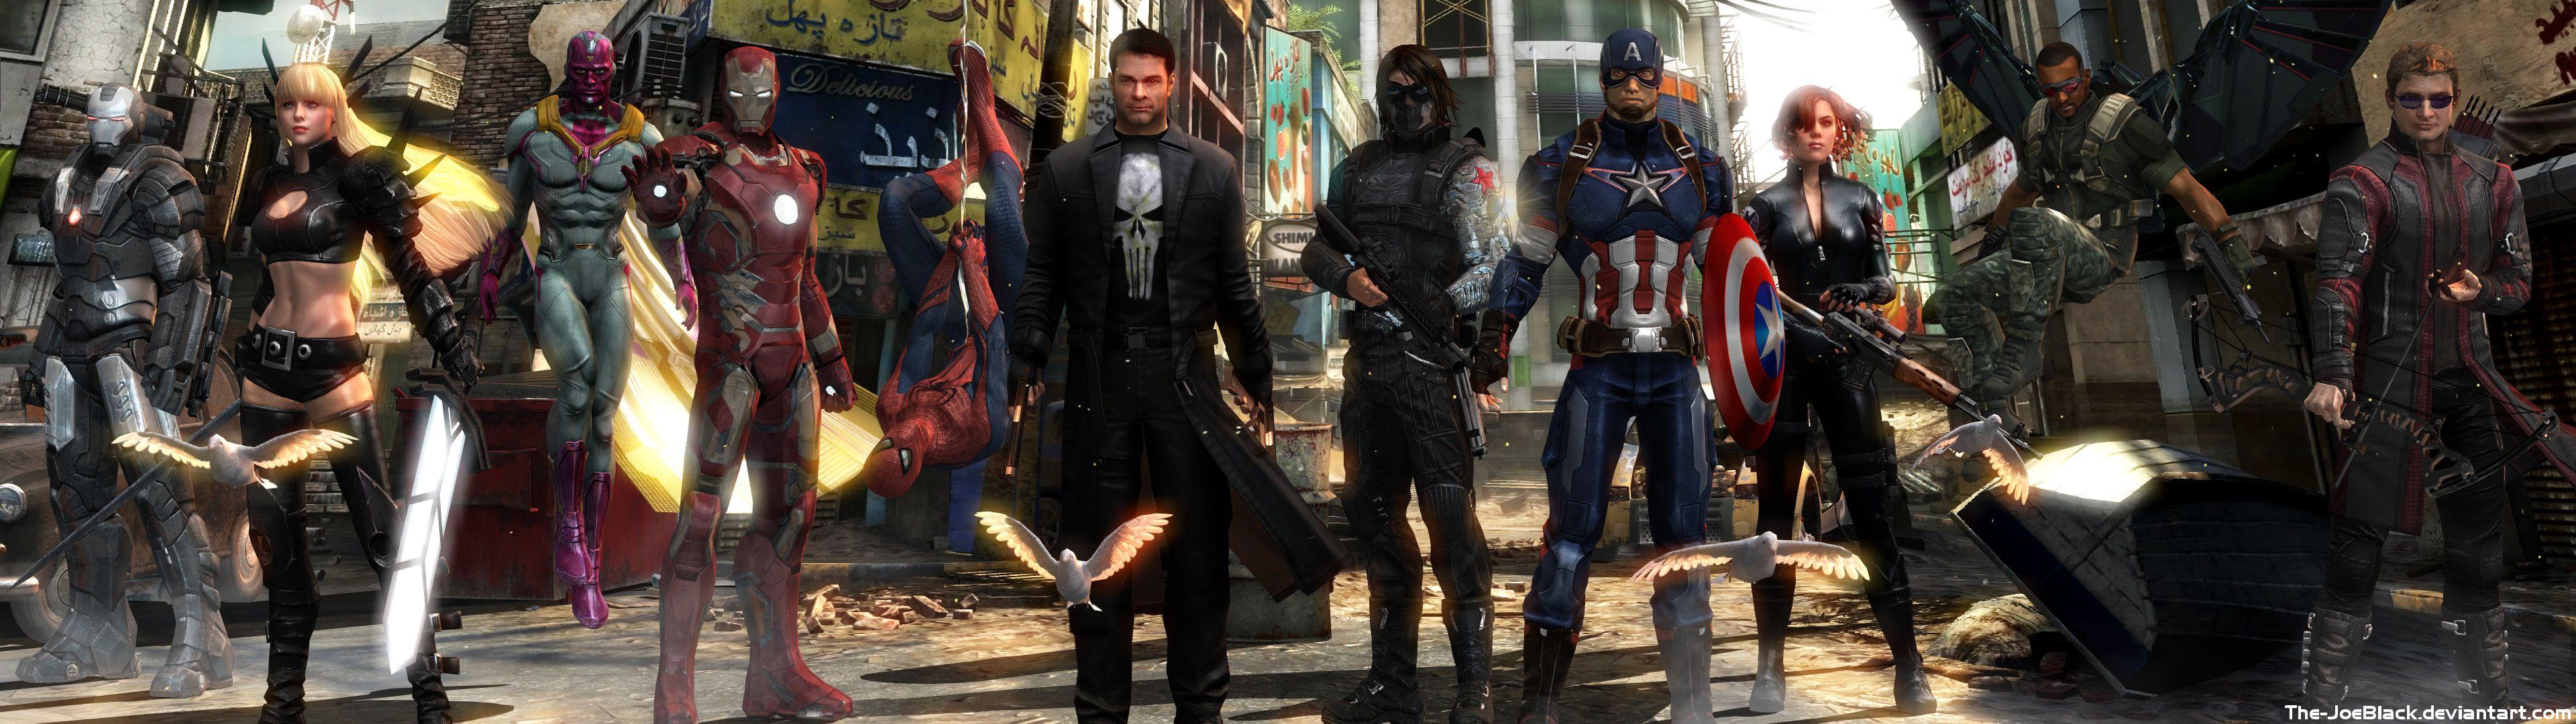 Avengers - Dual Screen Wallpaper by The-JoeBlack